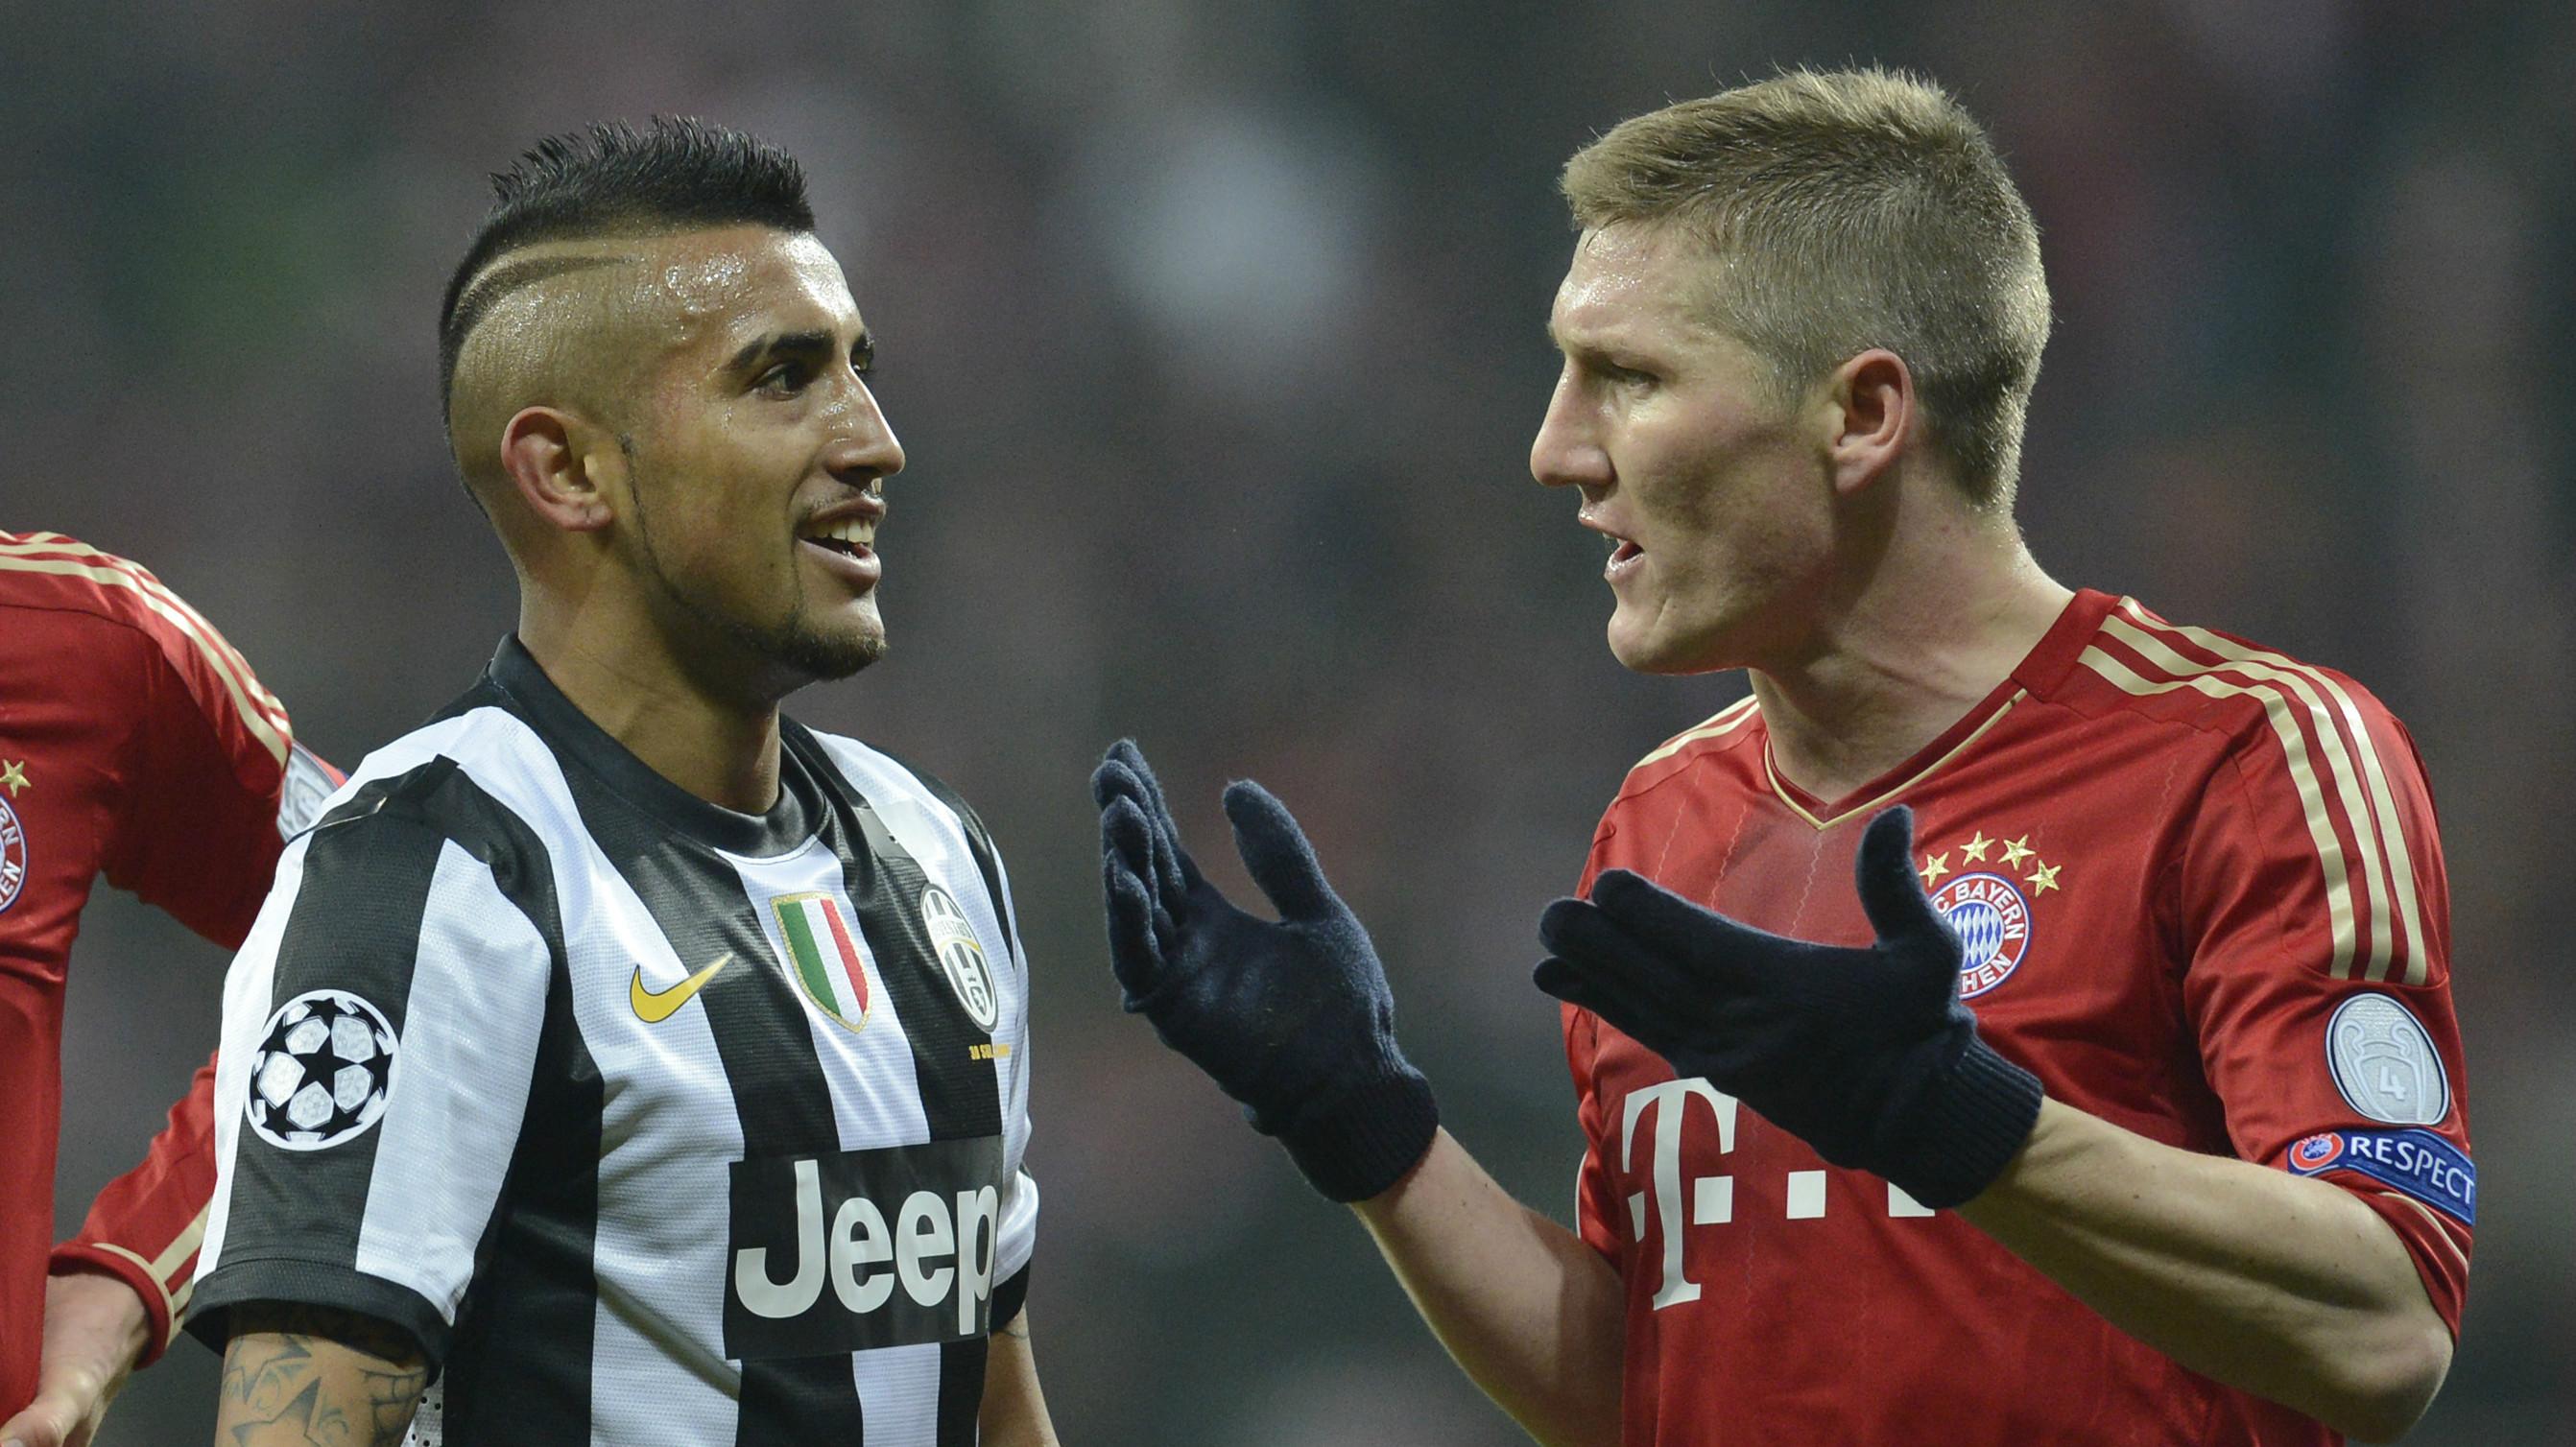 Pedro, Benzema, De Gea - Could Di Maria to PSG spark a Europe-wide transfer frenzy?